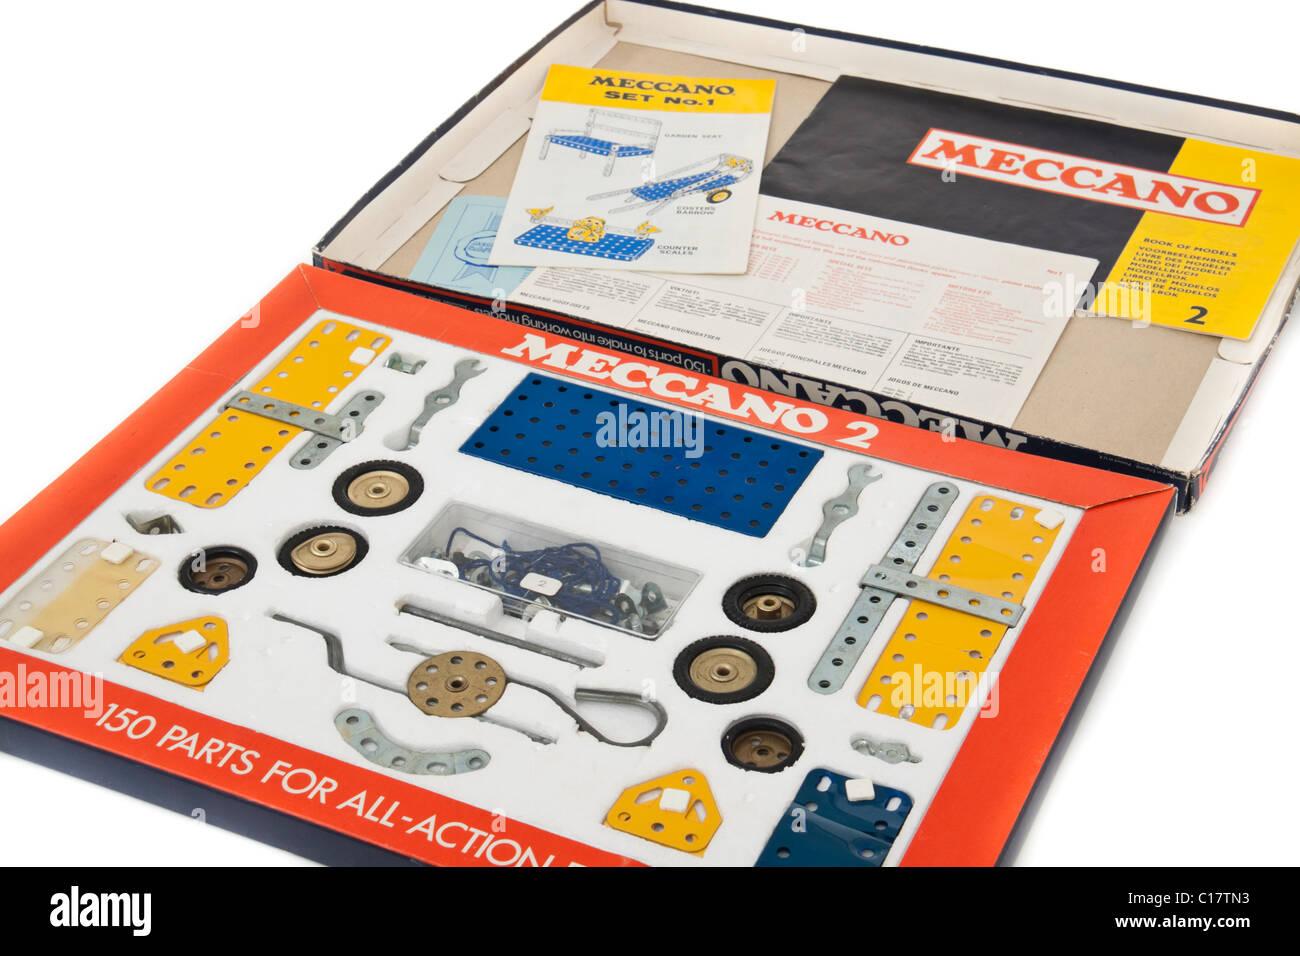 Vintage 1973 Meccano construction kit No 2 - Stock Image